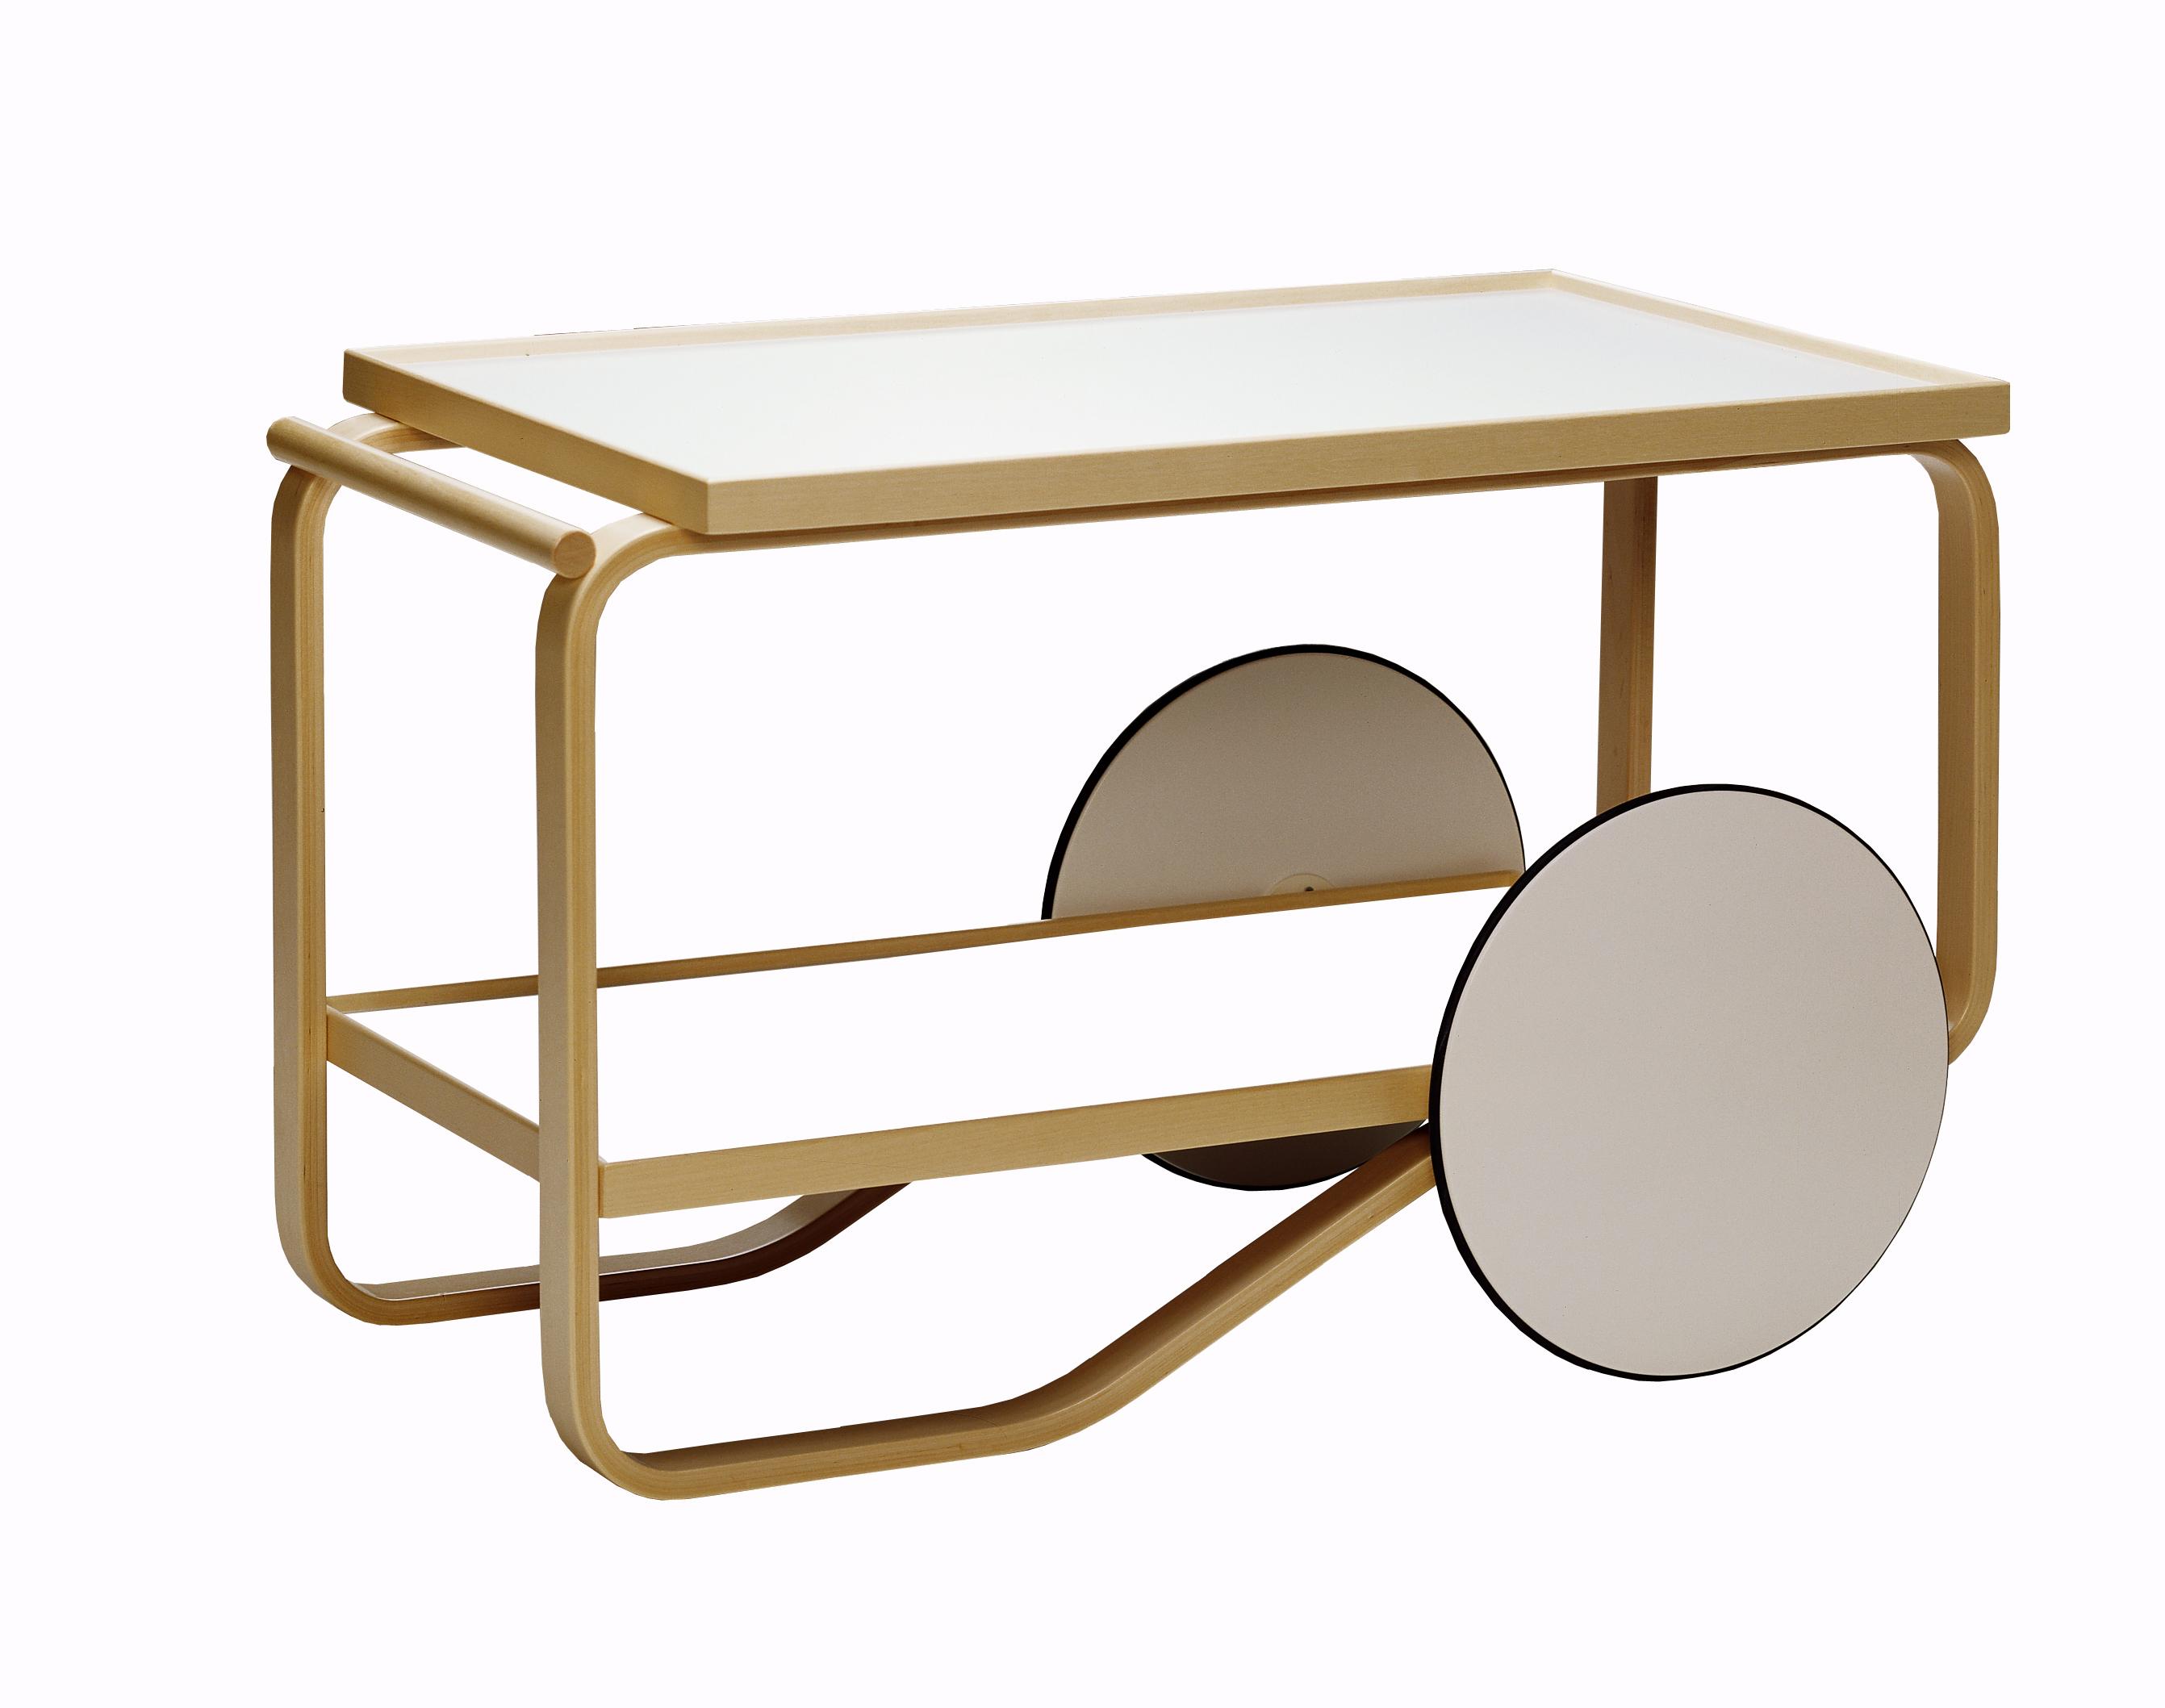 Alvar aalto 39 s furnitures tea trolley 901 artek - Table roulante desserte ...